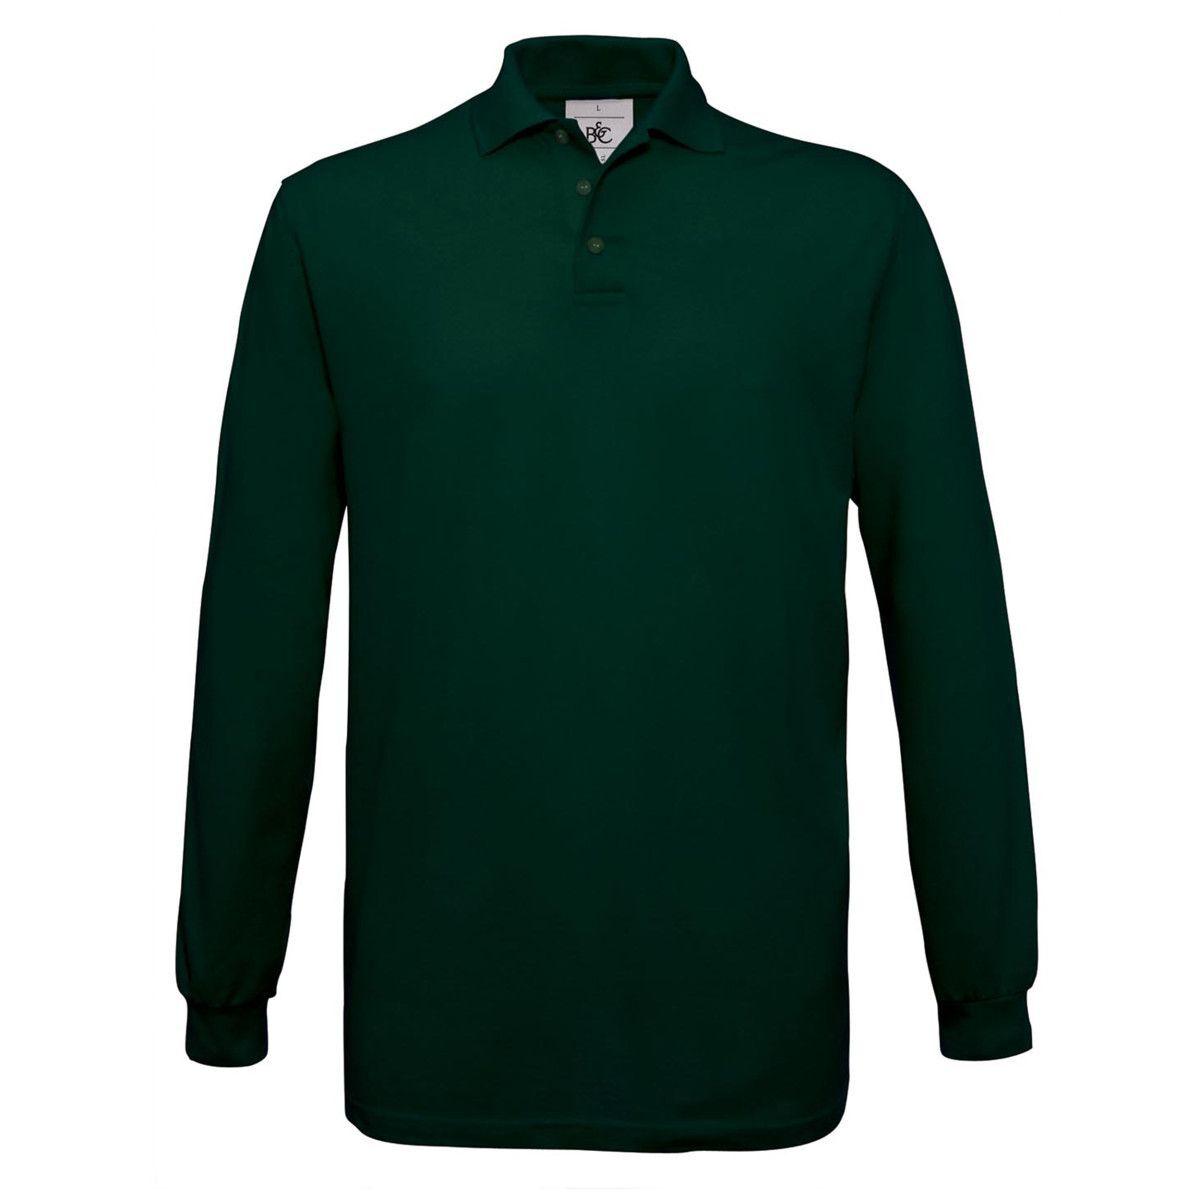 B&C Safran Long Sleeve Piqué Polo Shirts Mens (Green)